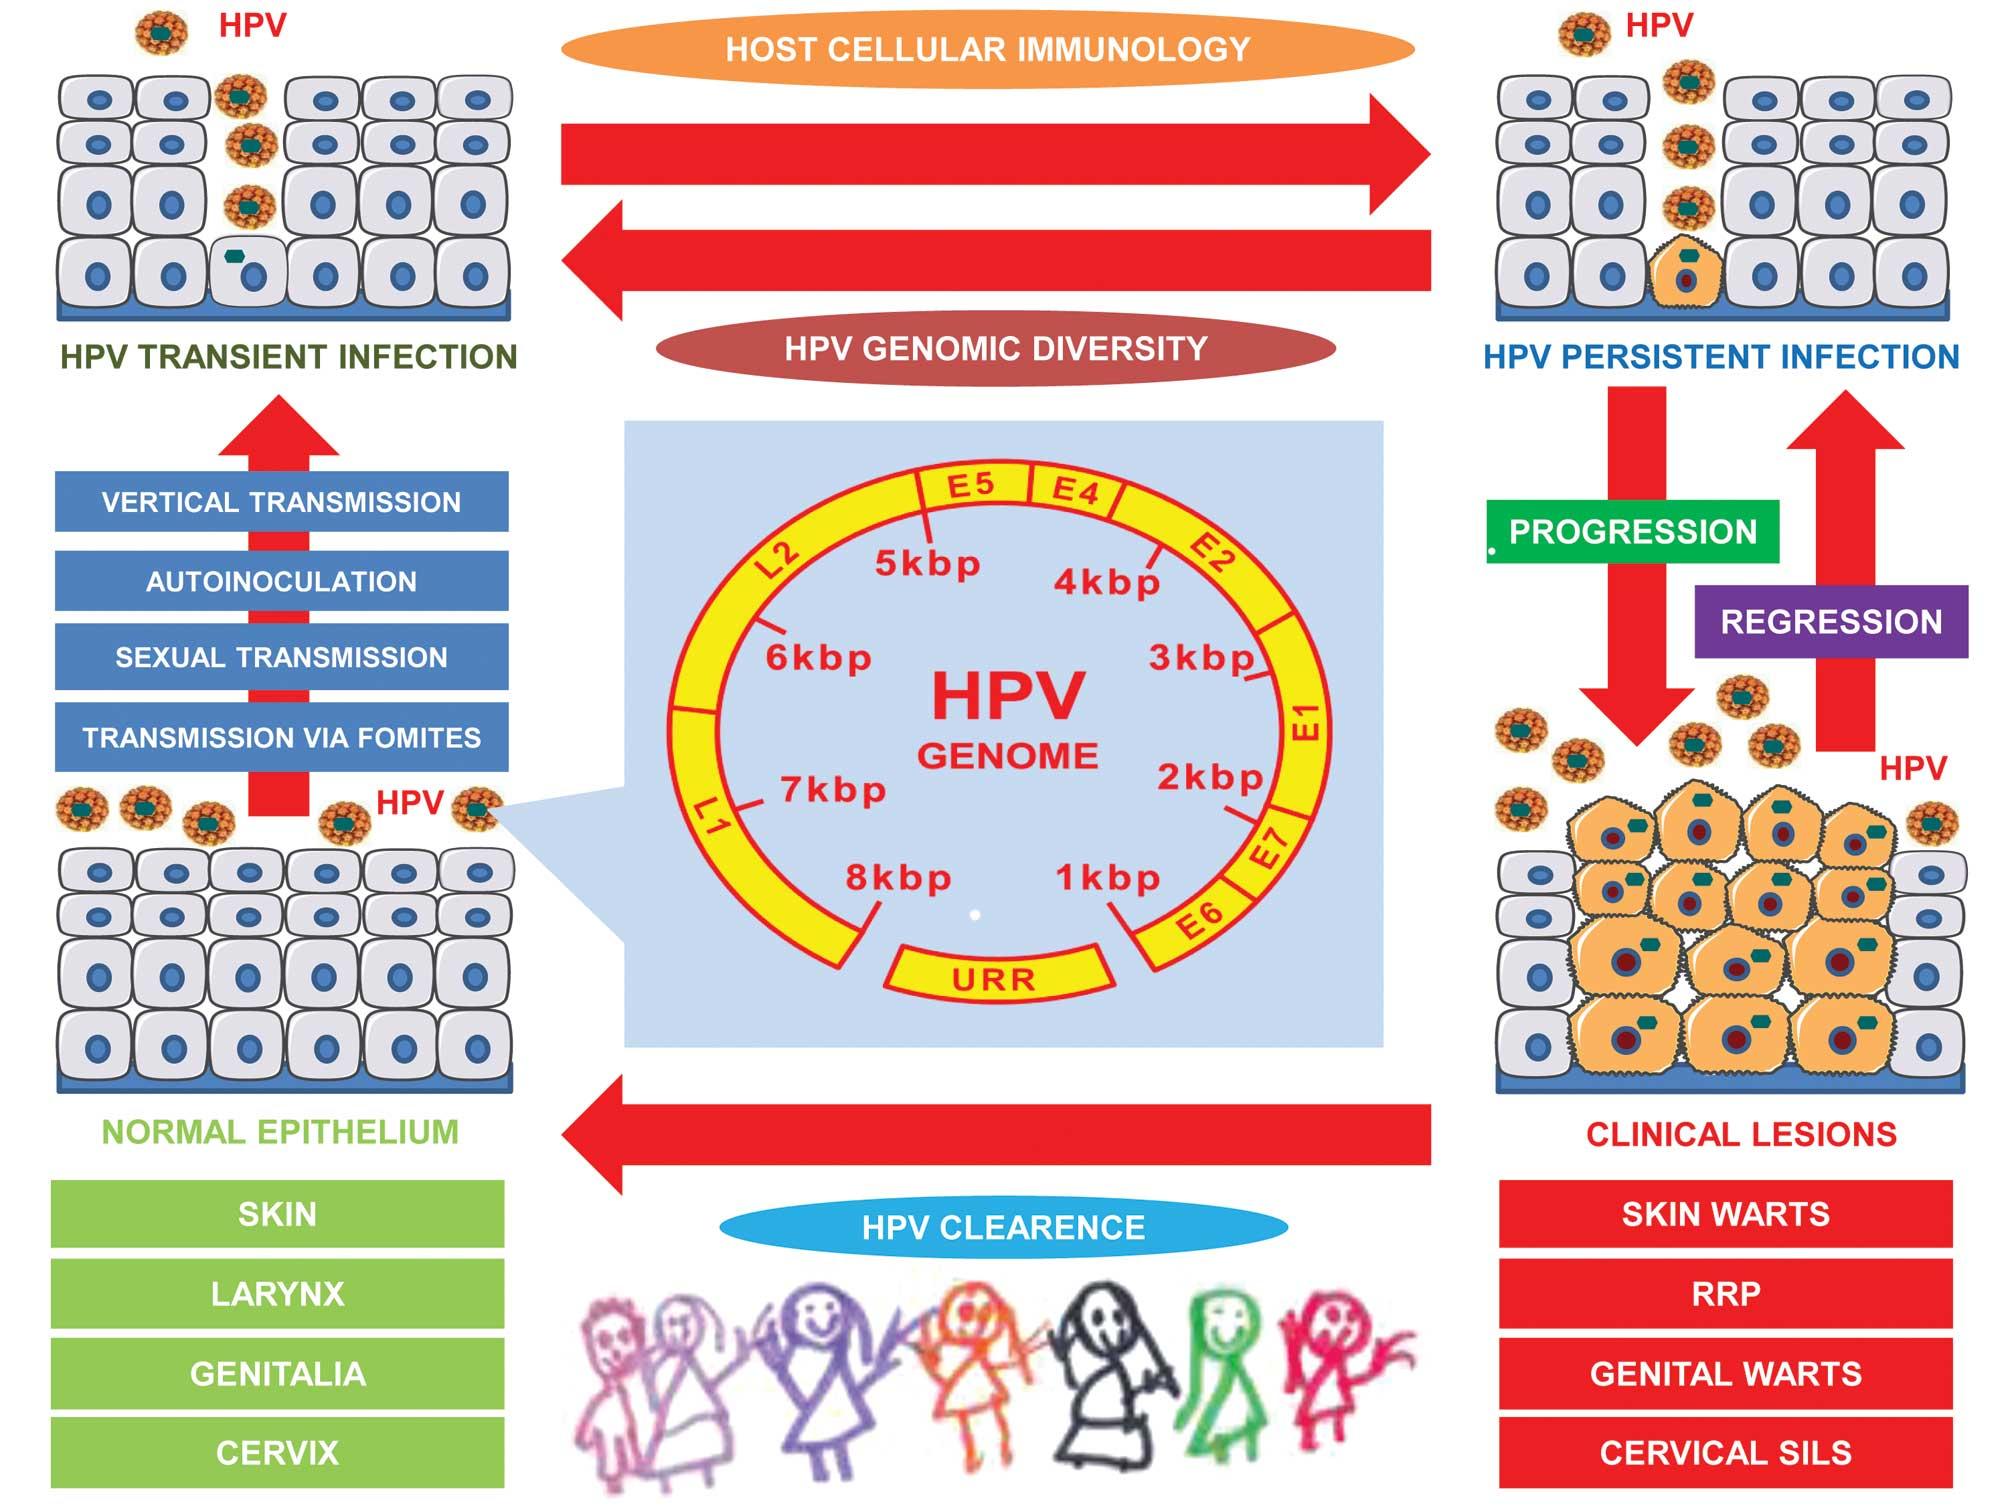 mechanism for human papillomavirus transmission at birth